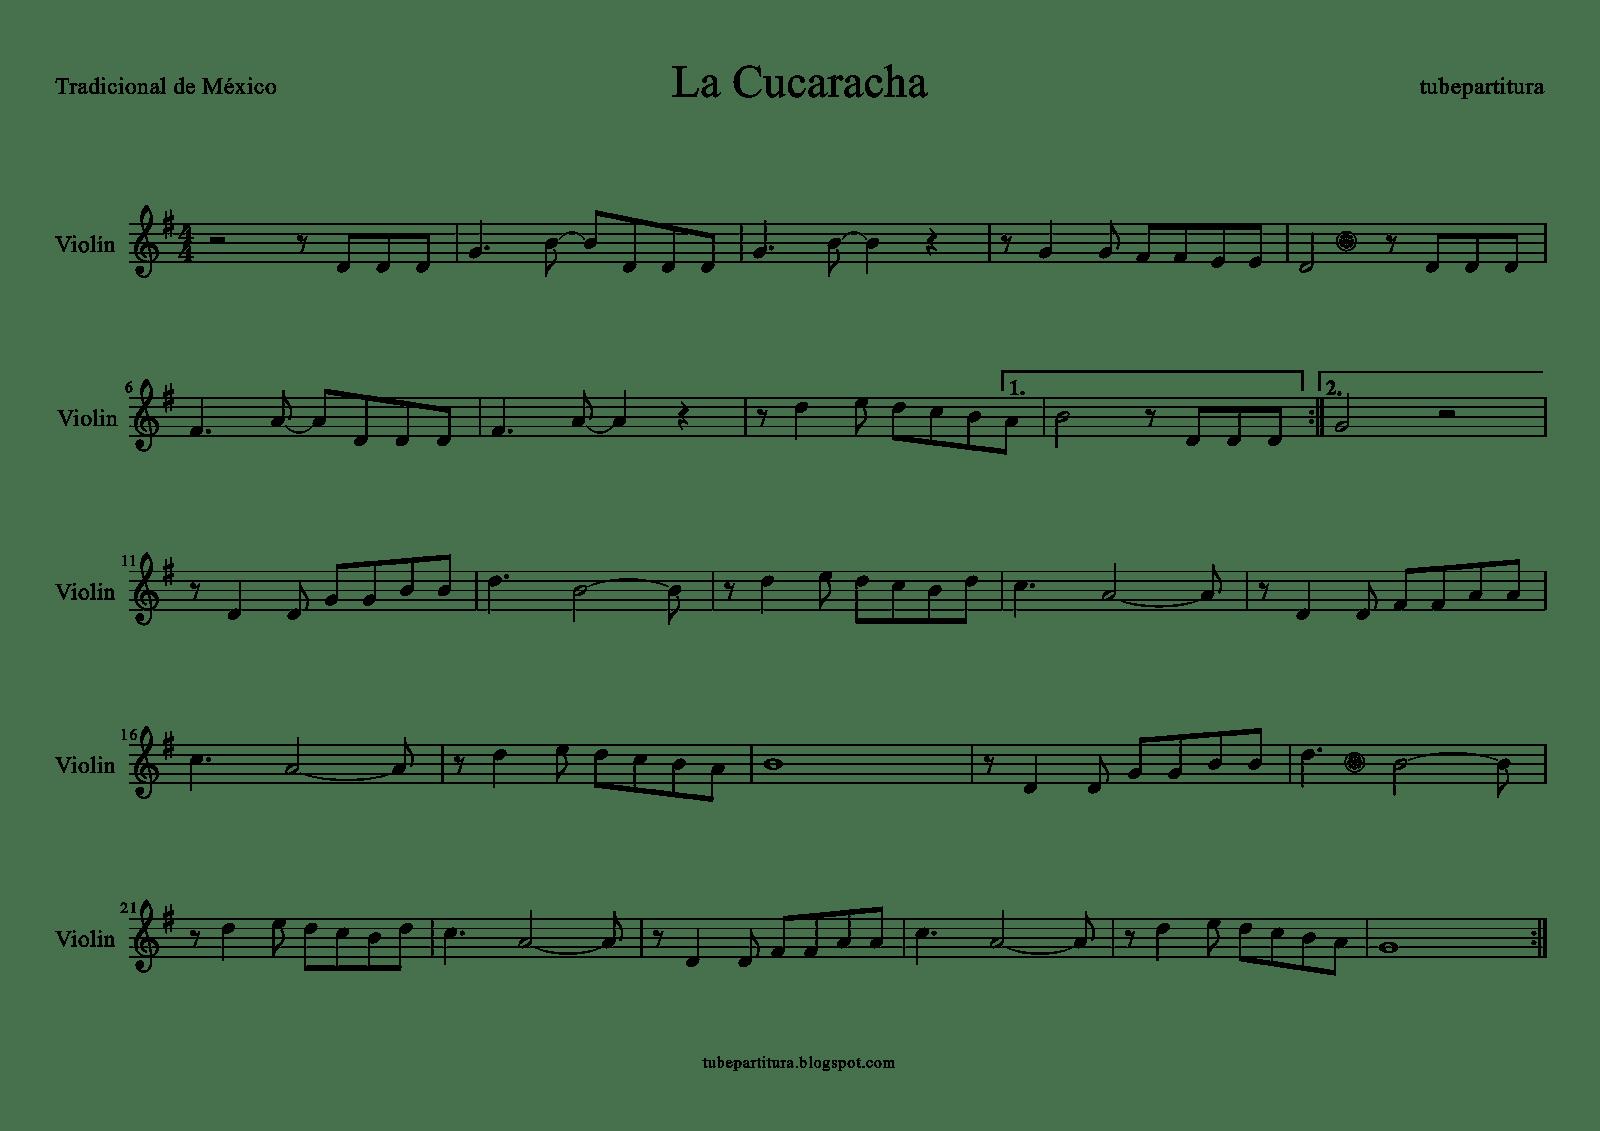 La Cucaracha Violin 1